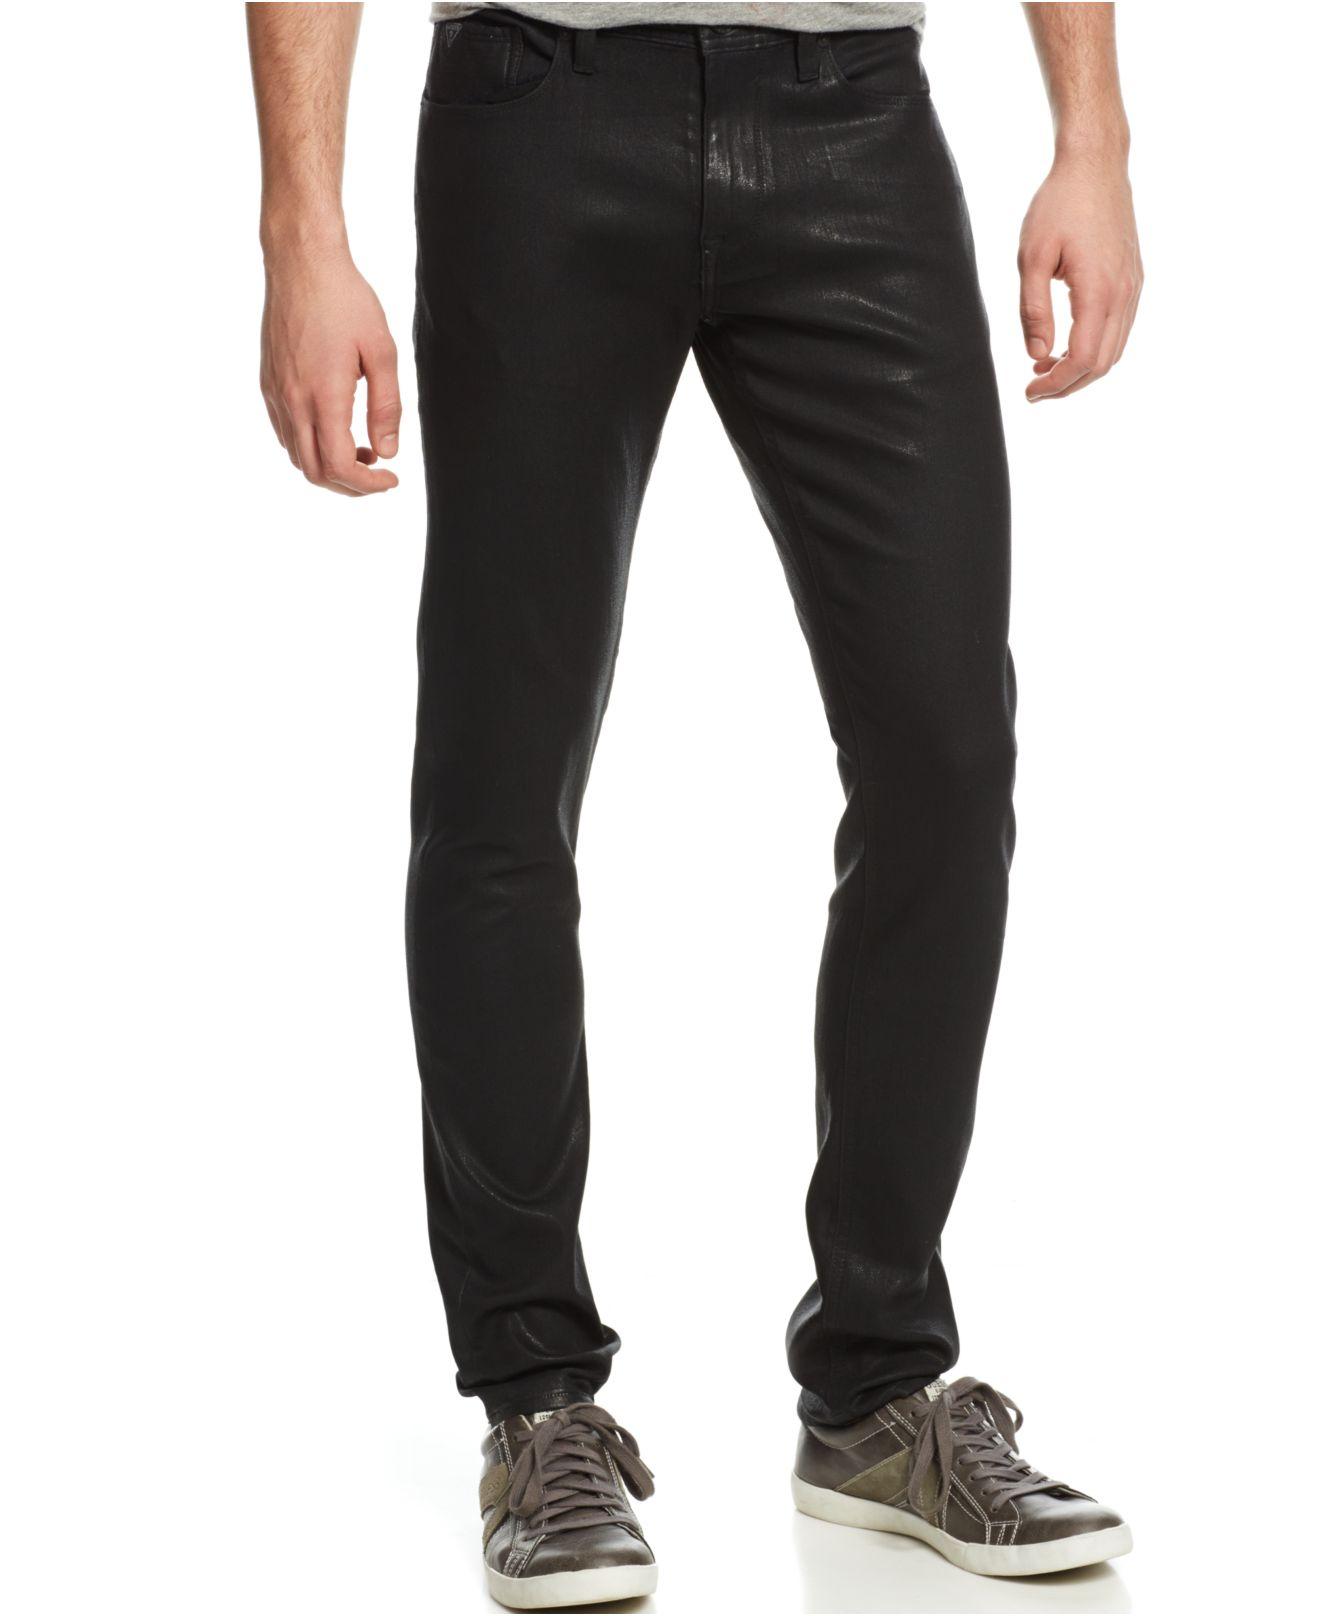 Mens Slim Fit Black Jeans